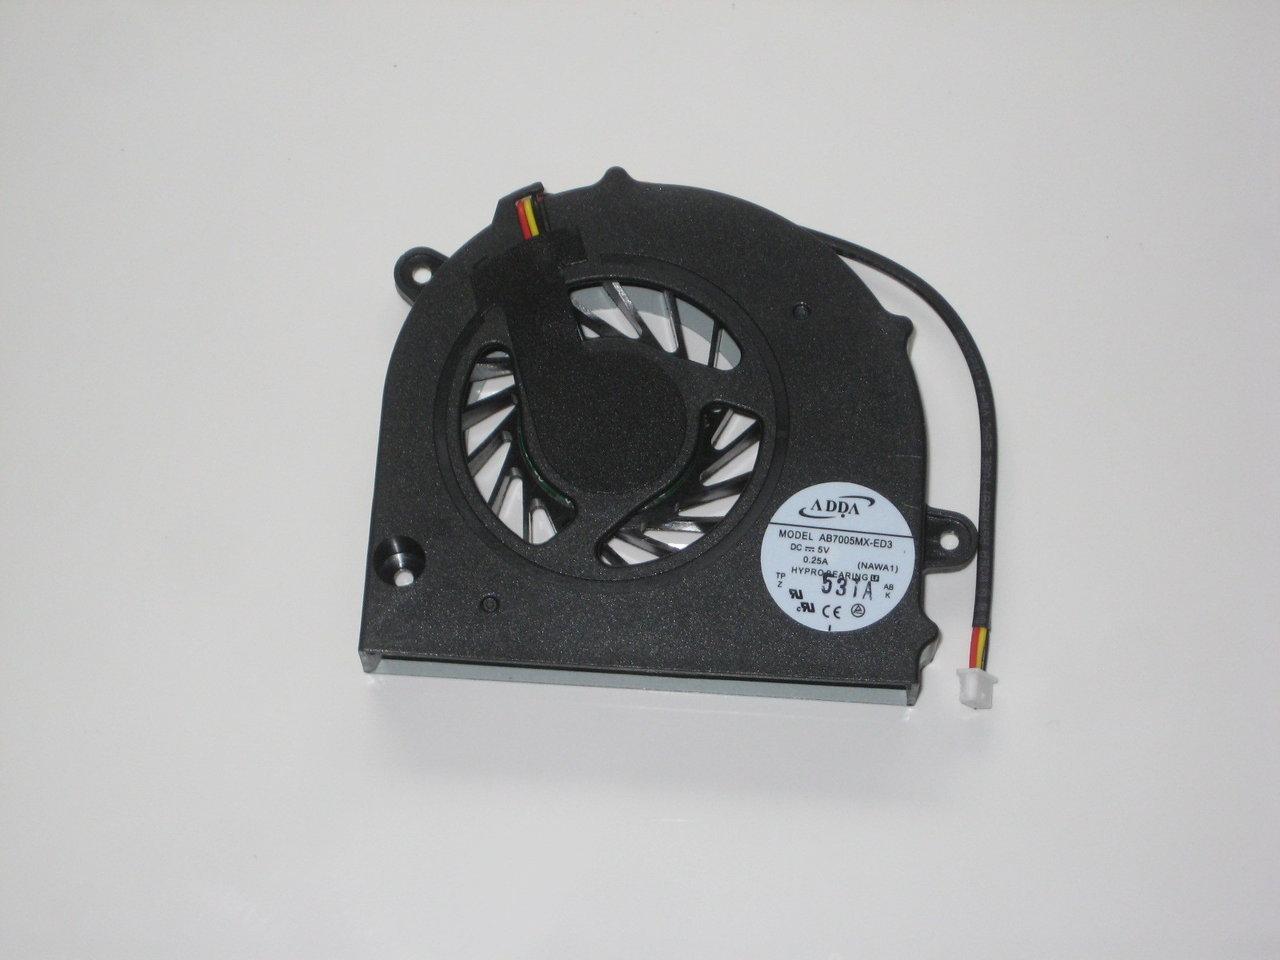 ADDA AB7005MX-ED3 Kühler Lüfter für TOSHIBA LENOVO ACER eMachines